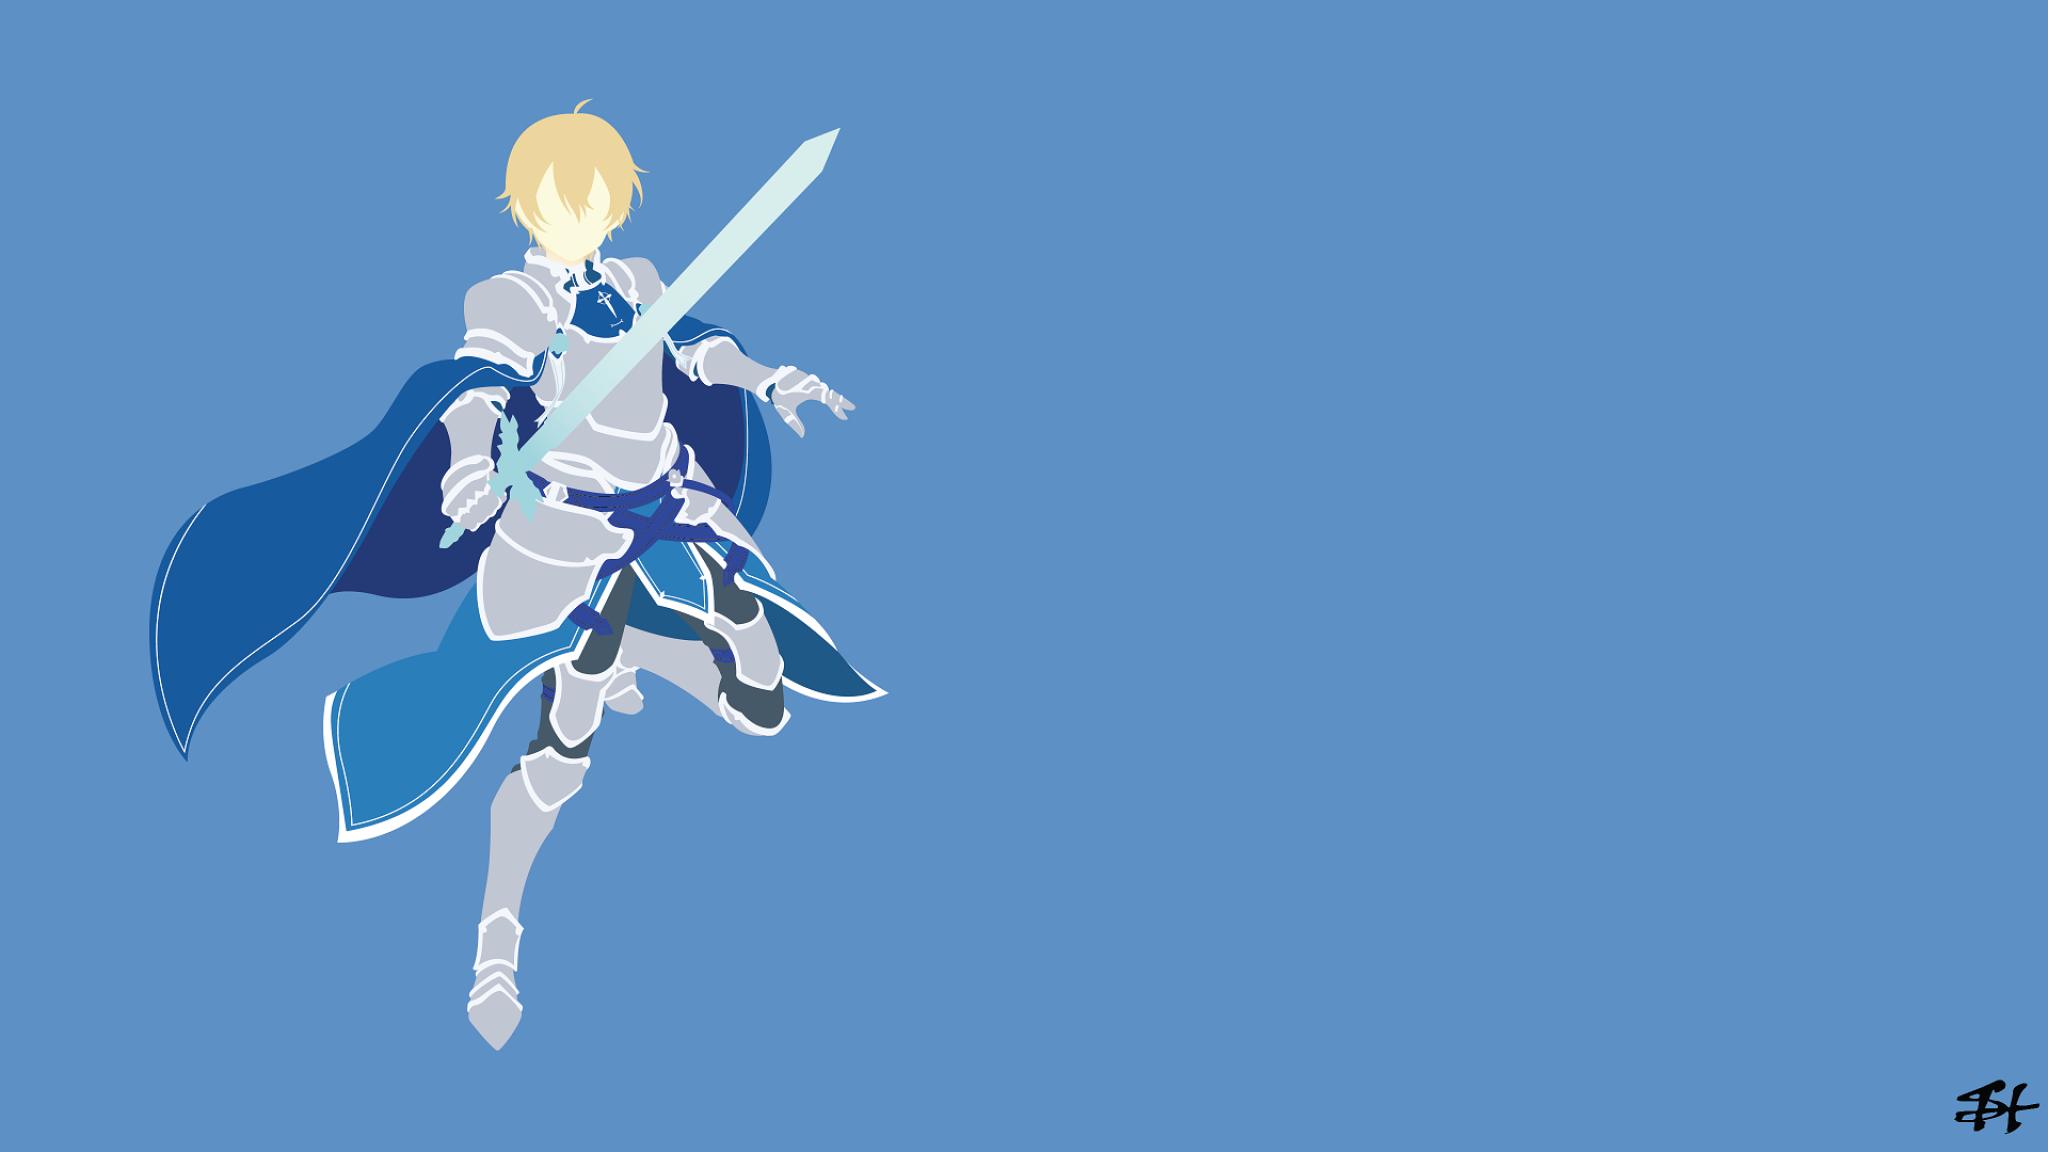 2048x1152 Sword Art Online Alicization Eugeo 2048x1152 Resolution